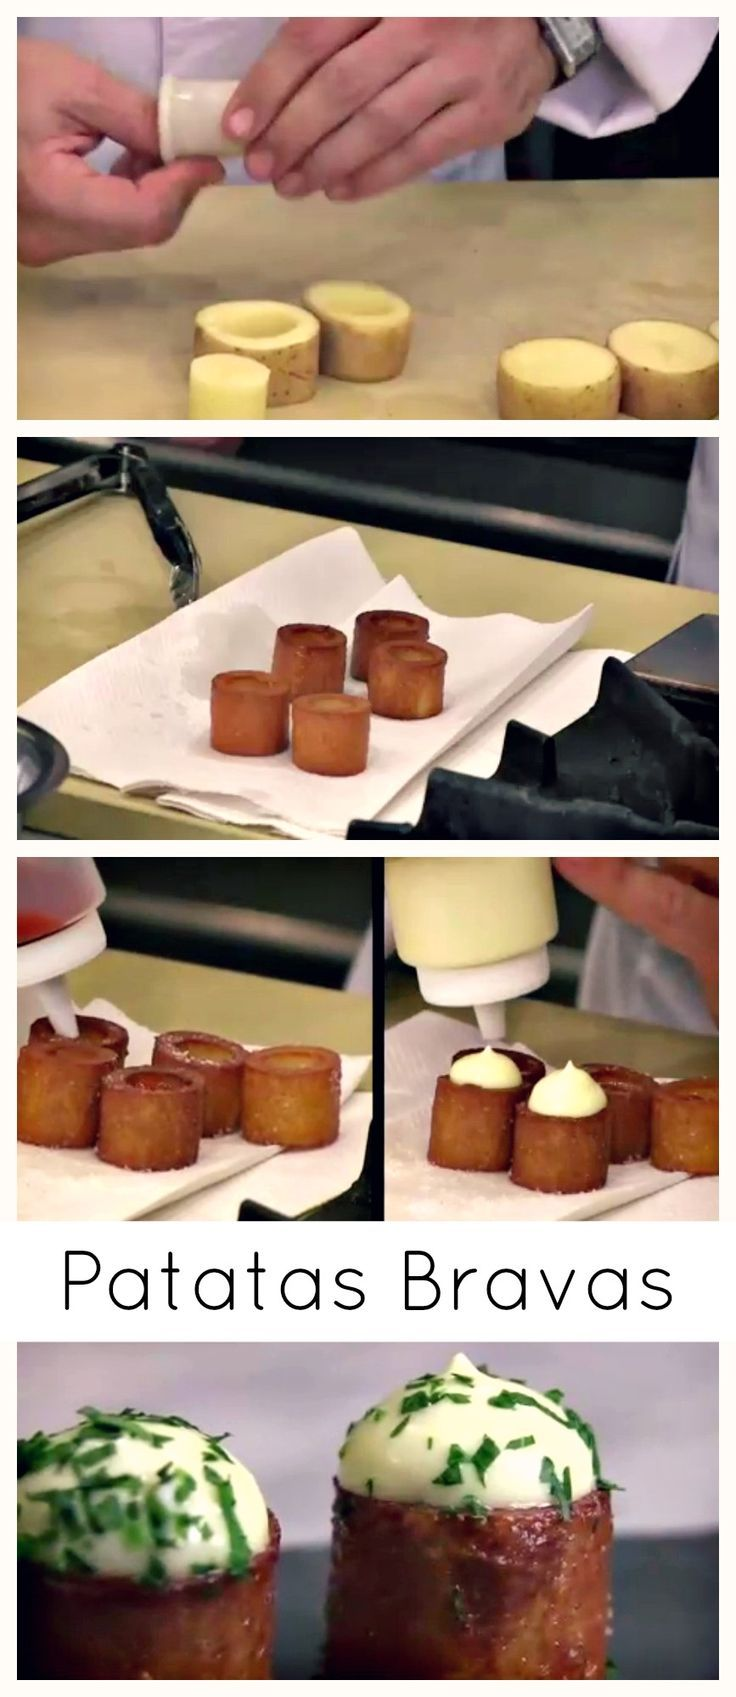 #Patatas Bravas: How To Make The #Spanish Classic #AppetizerFood: